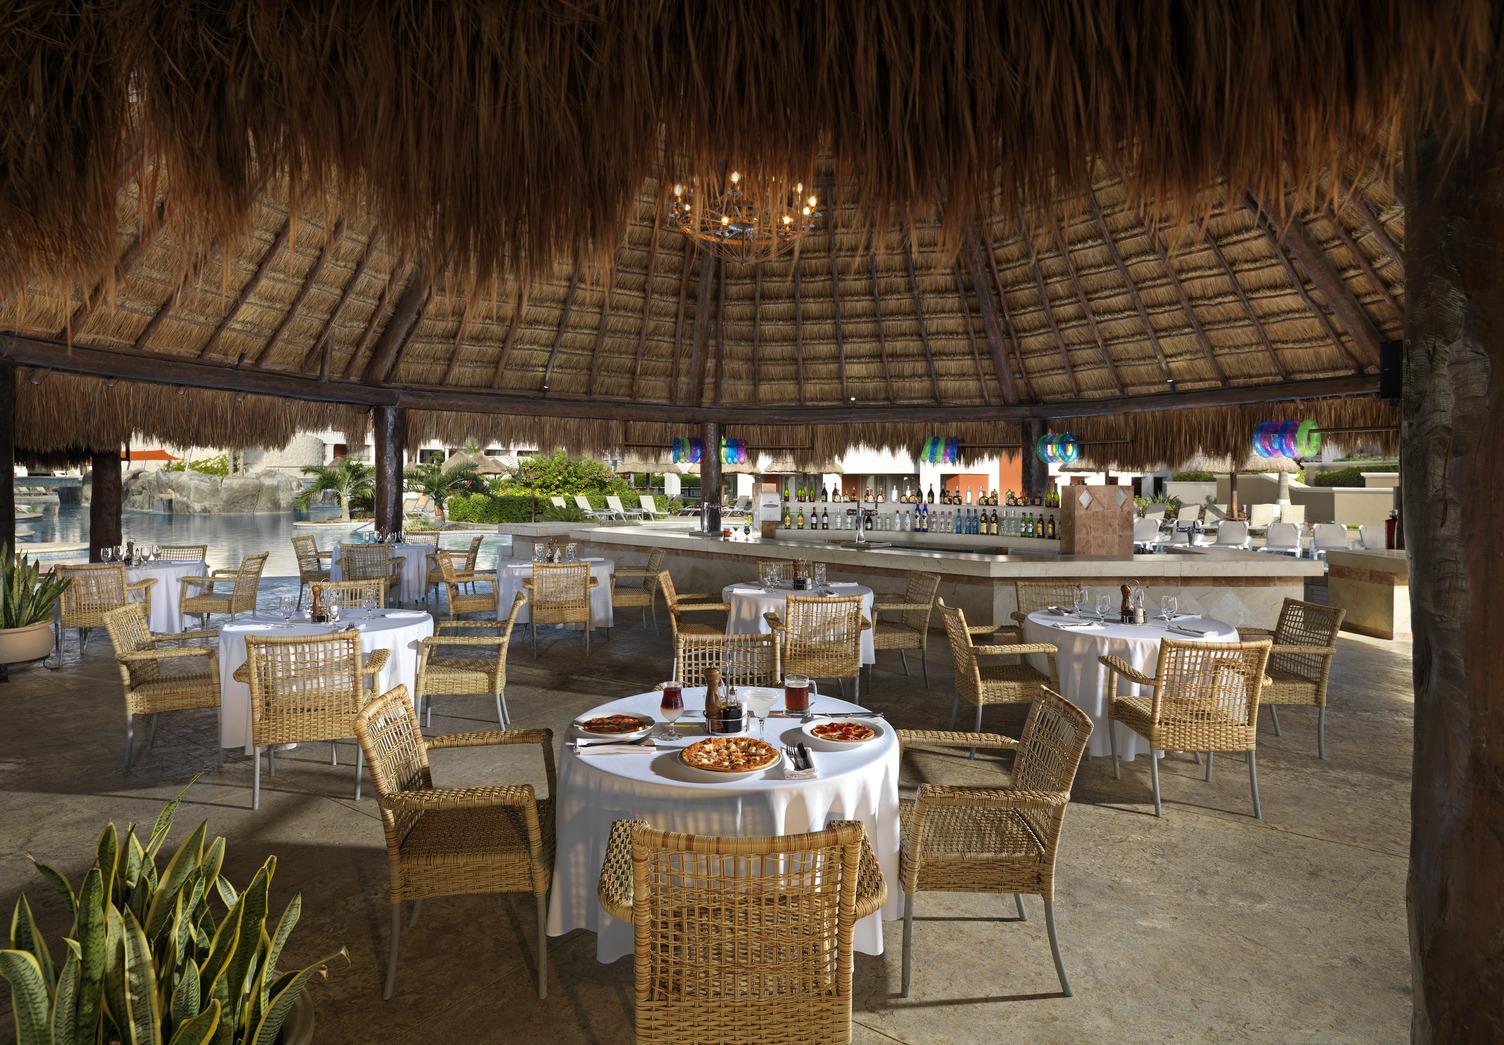 Travel Agency All-Inclusive Resort Heaven at Hard Rock Hotel Riviera Maya 46